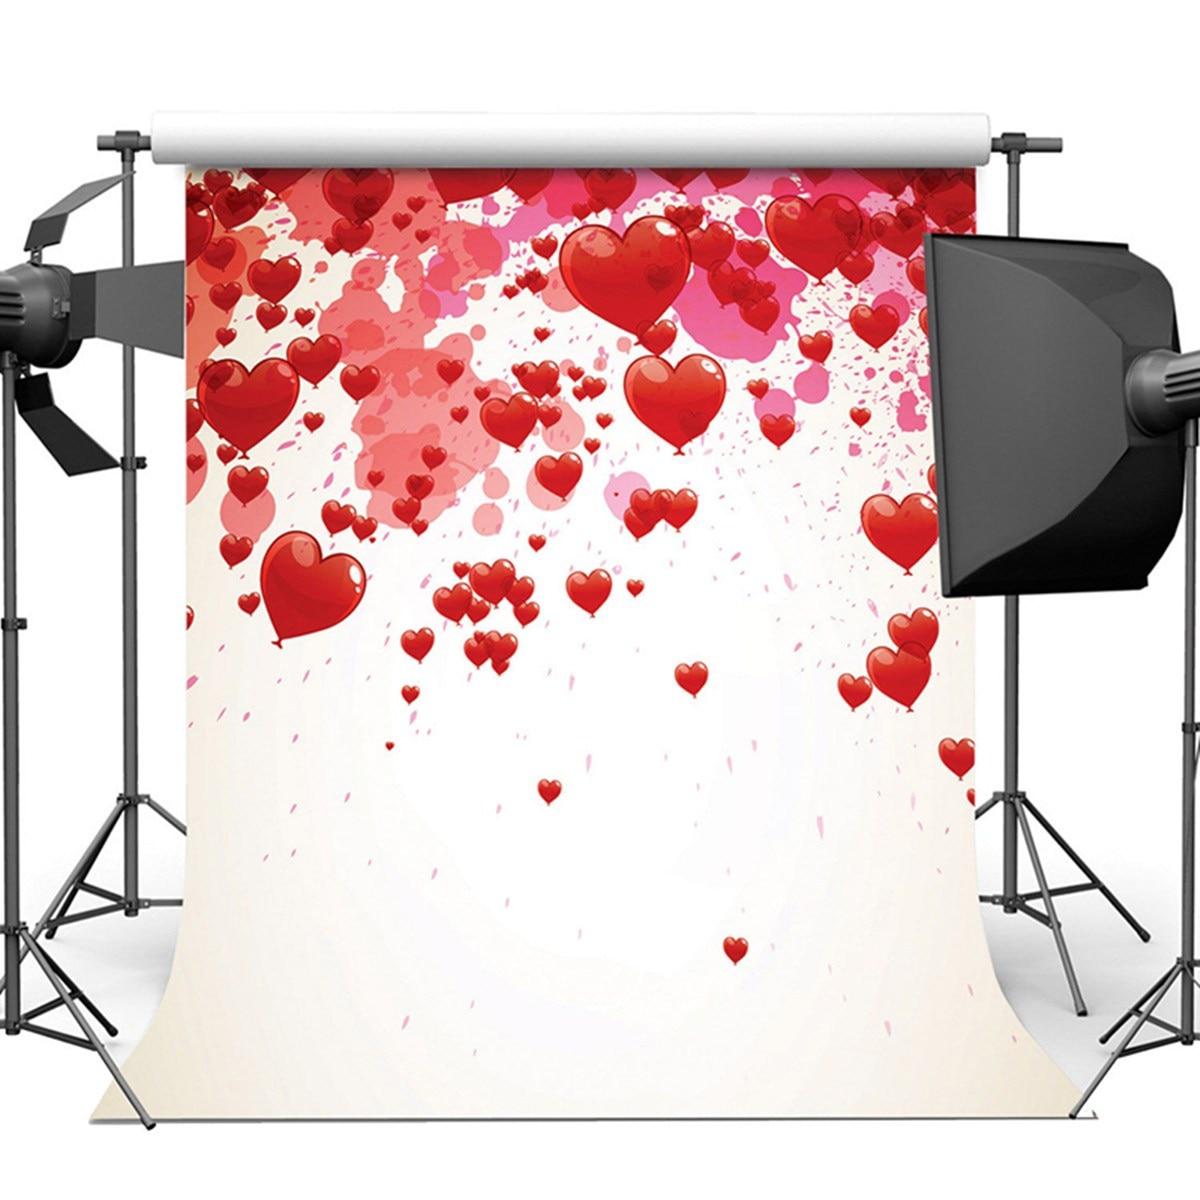 8X8FT Vinyl Love Heart Photography Background Studio Backdrop Wedding Photo Prop 2018 New Arrival 8x8ft black white stripes wall custom vinyl photography background studio photo prop photographic backdrop 2 4m x 2 4m